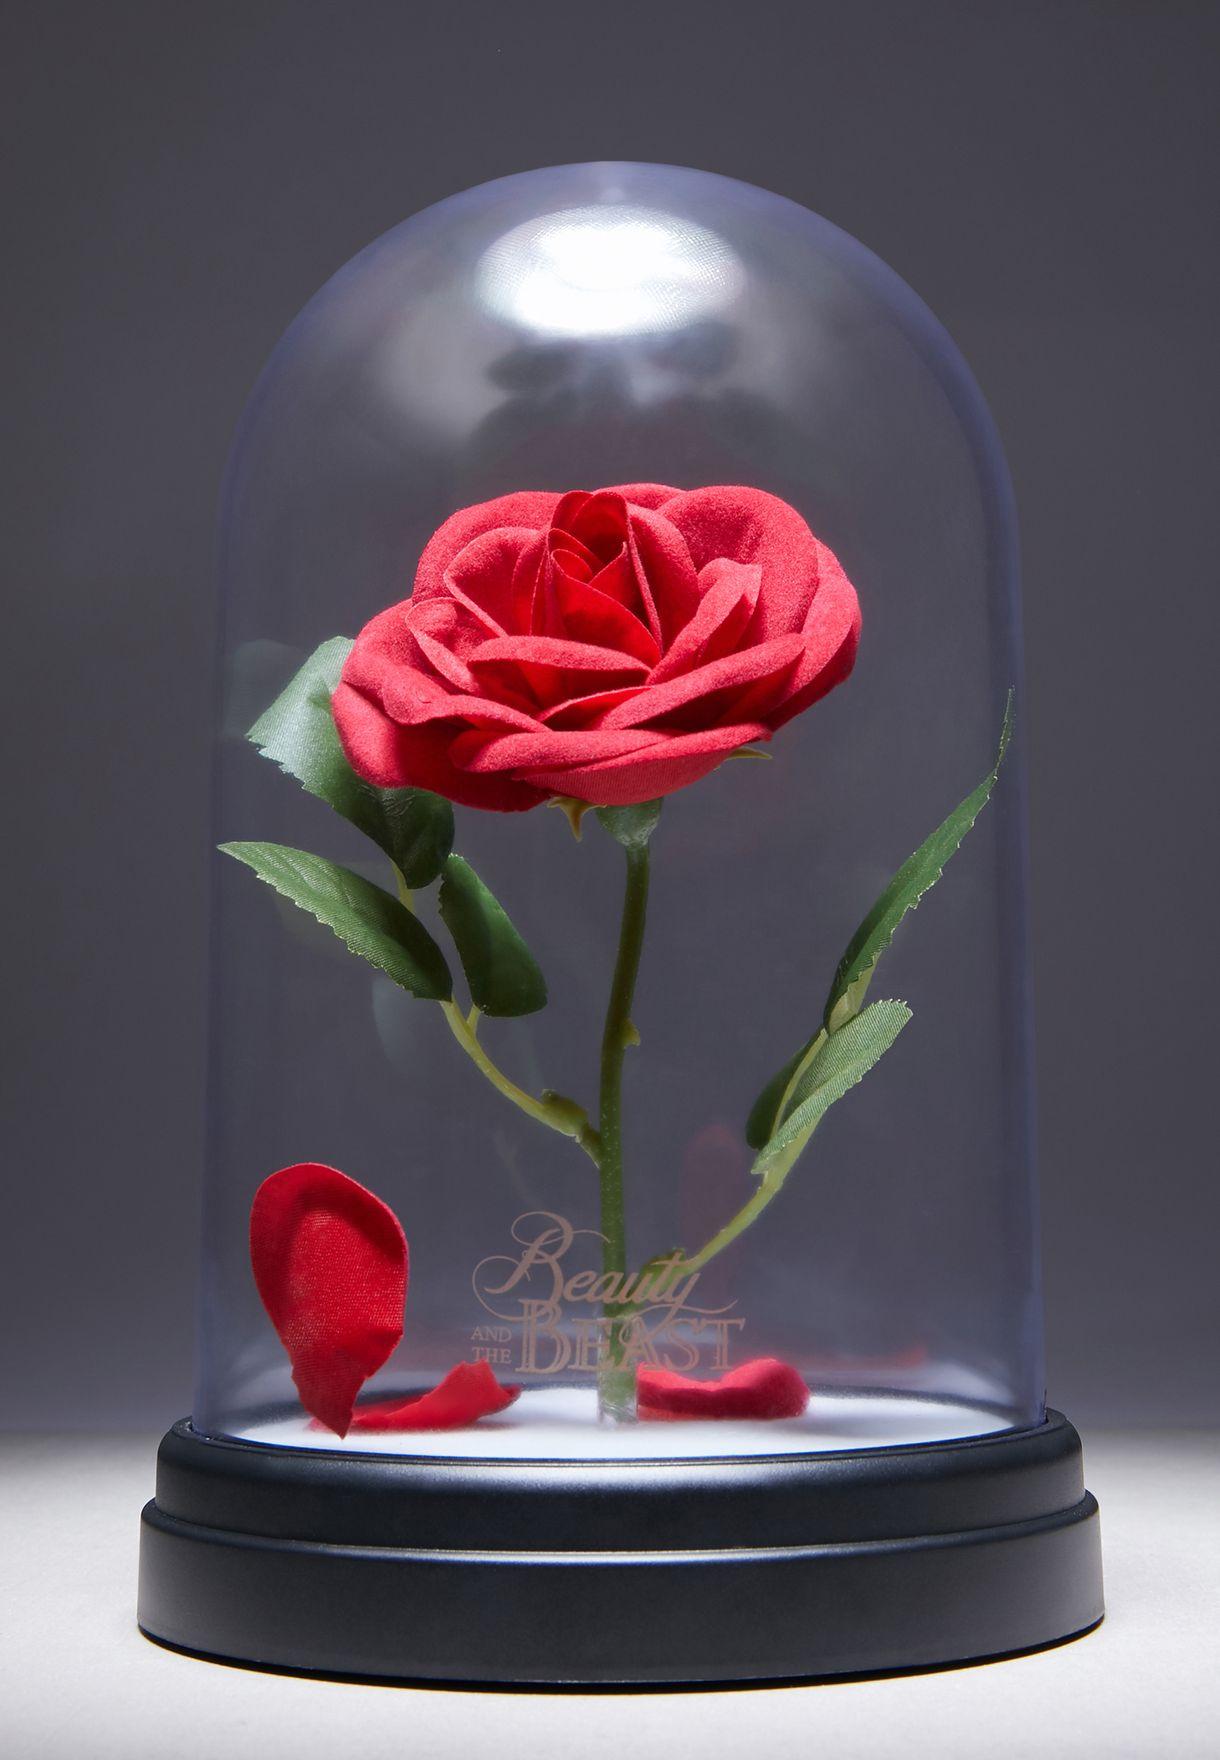 Beauty & The Beast Enchanted Rose Desk Lamp